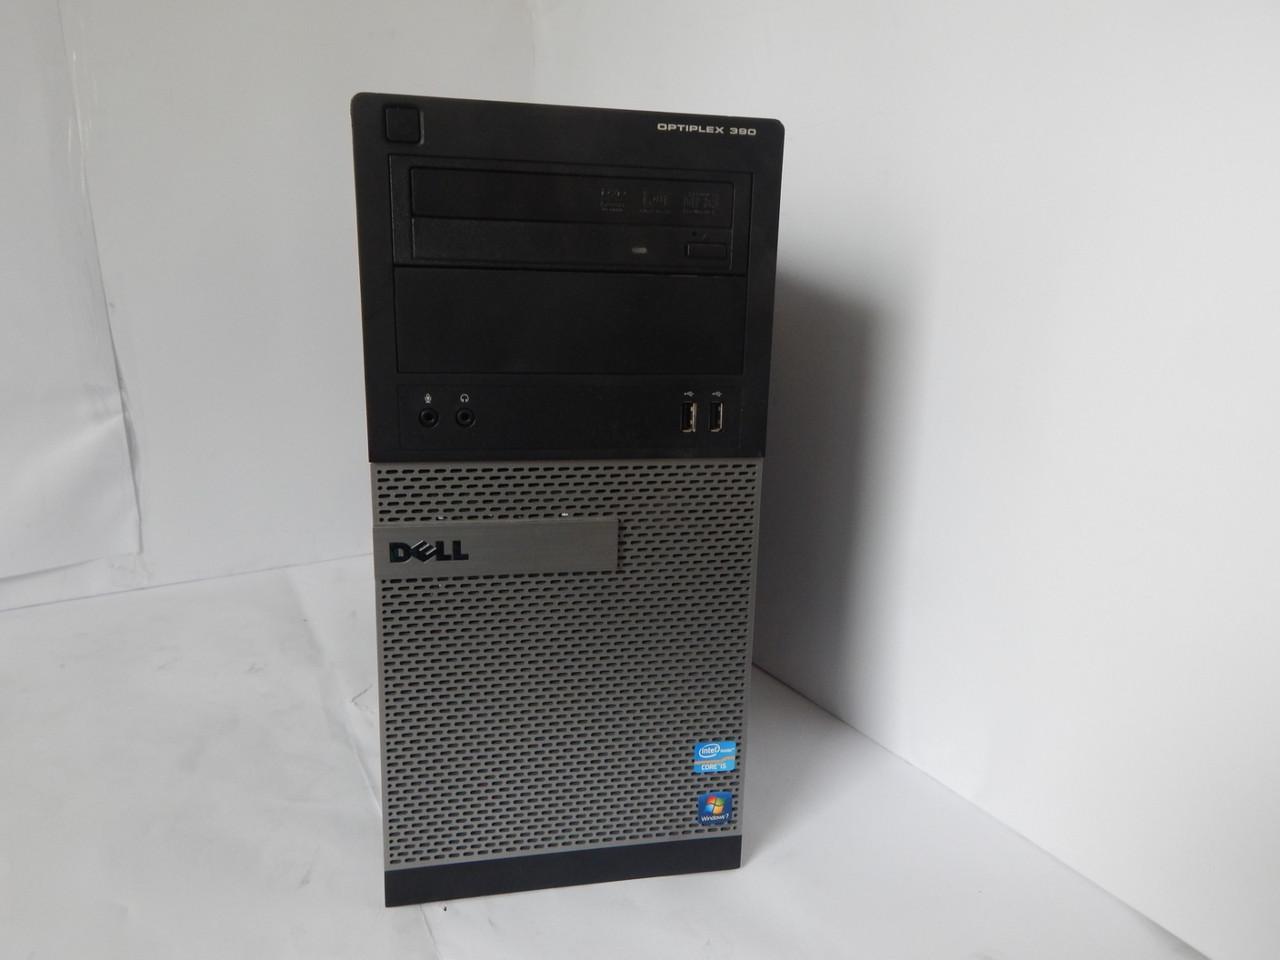 Системный блок Dell 3010 i3-3220 4RAM USB 3.0 Сокет 1155 компьютер VGA / HDMI